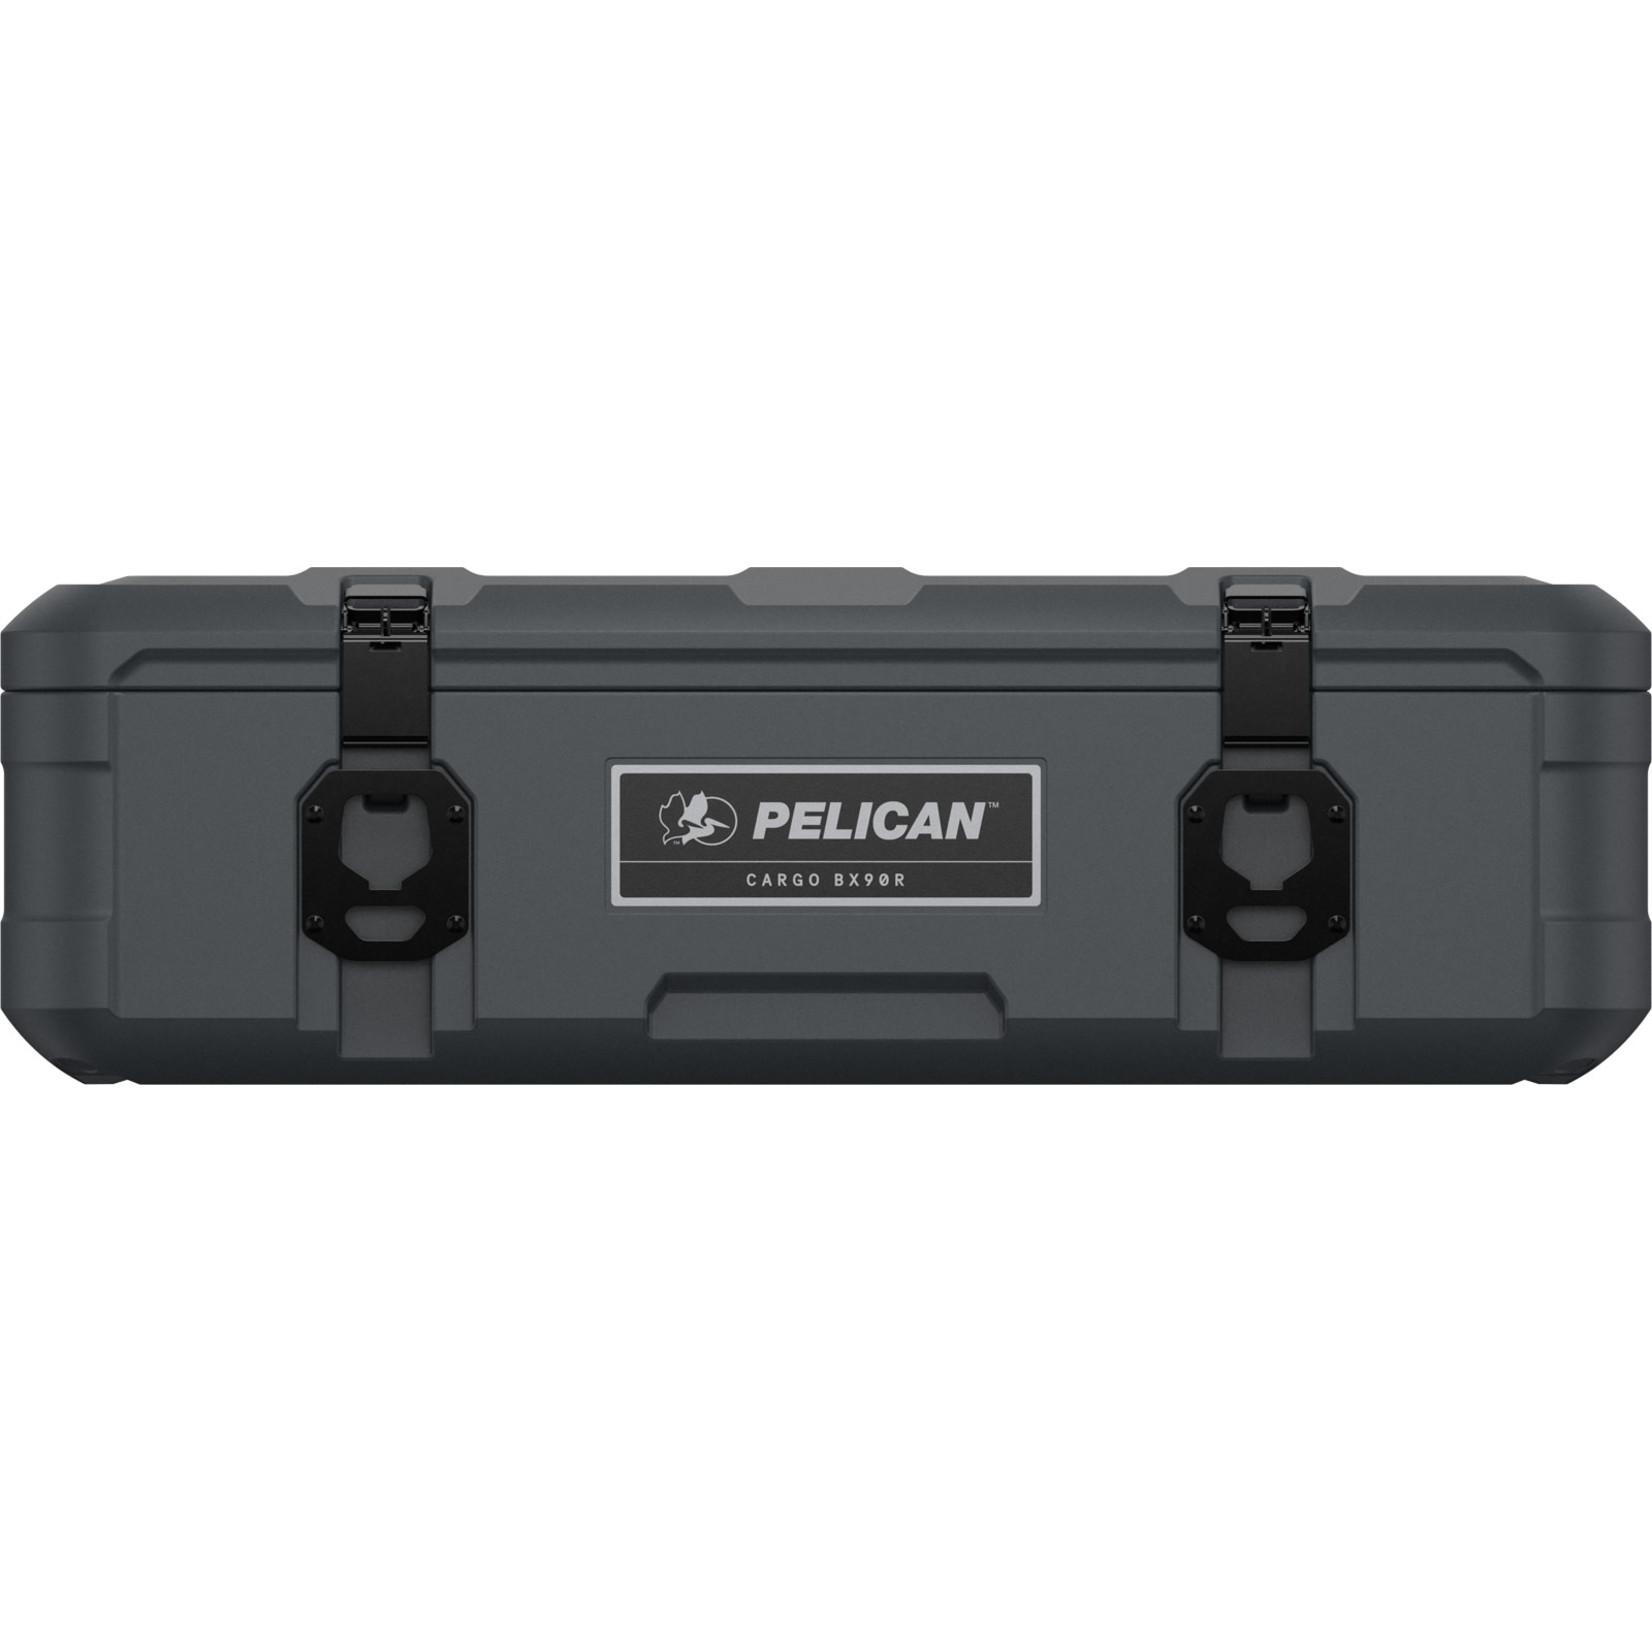 Pelican BX90R Cargo Case Black